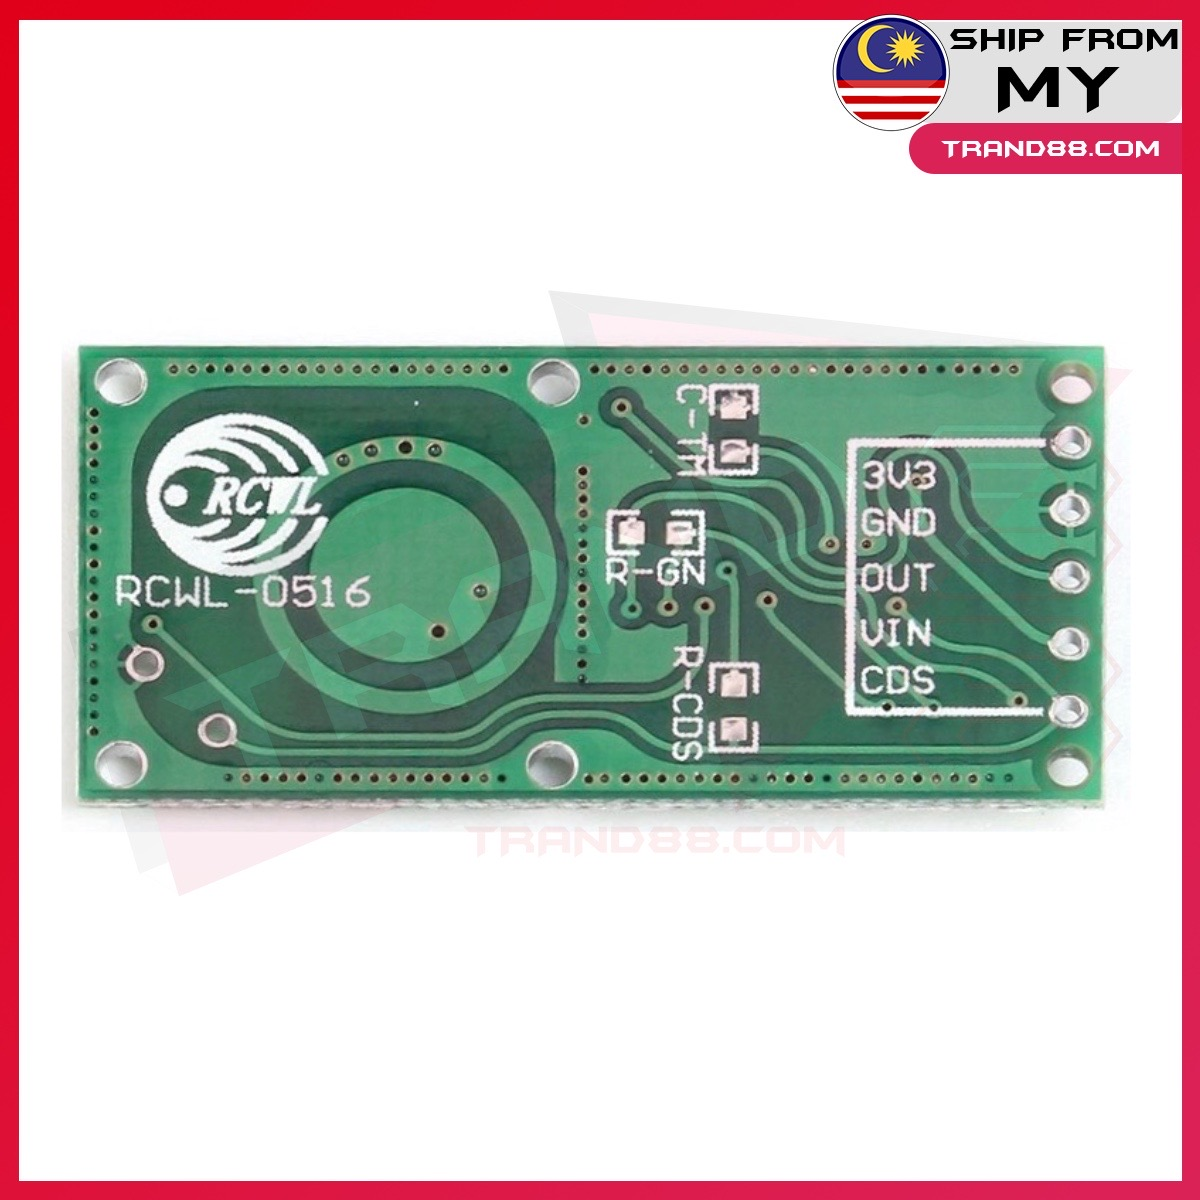 RCWL-0516 Doppler Radar Sensor Motion Detector Microwave Module for Arduino RCWL 0516 RCWL0516 movement sensor